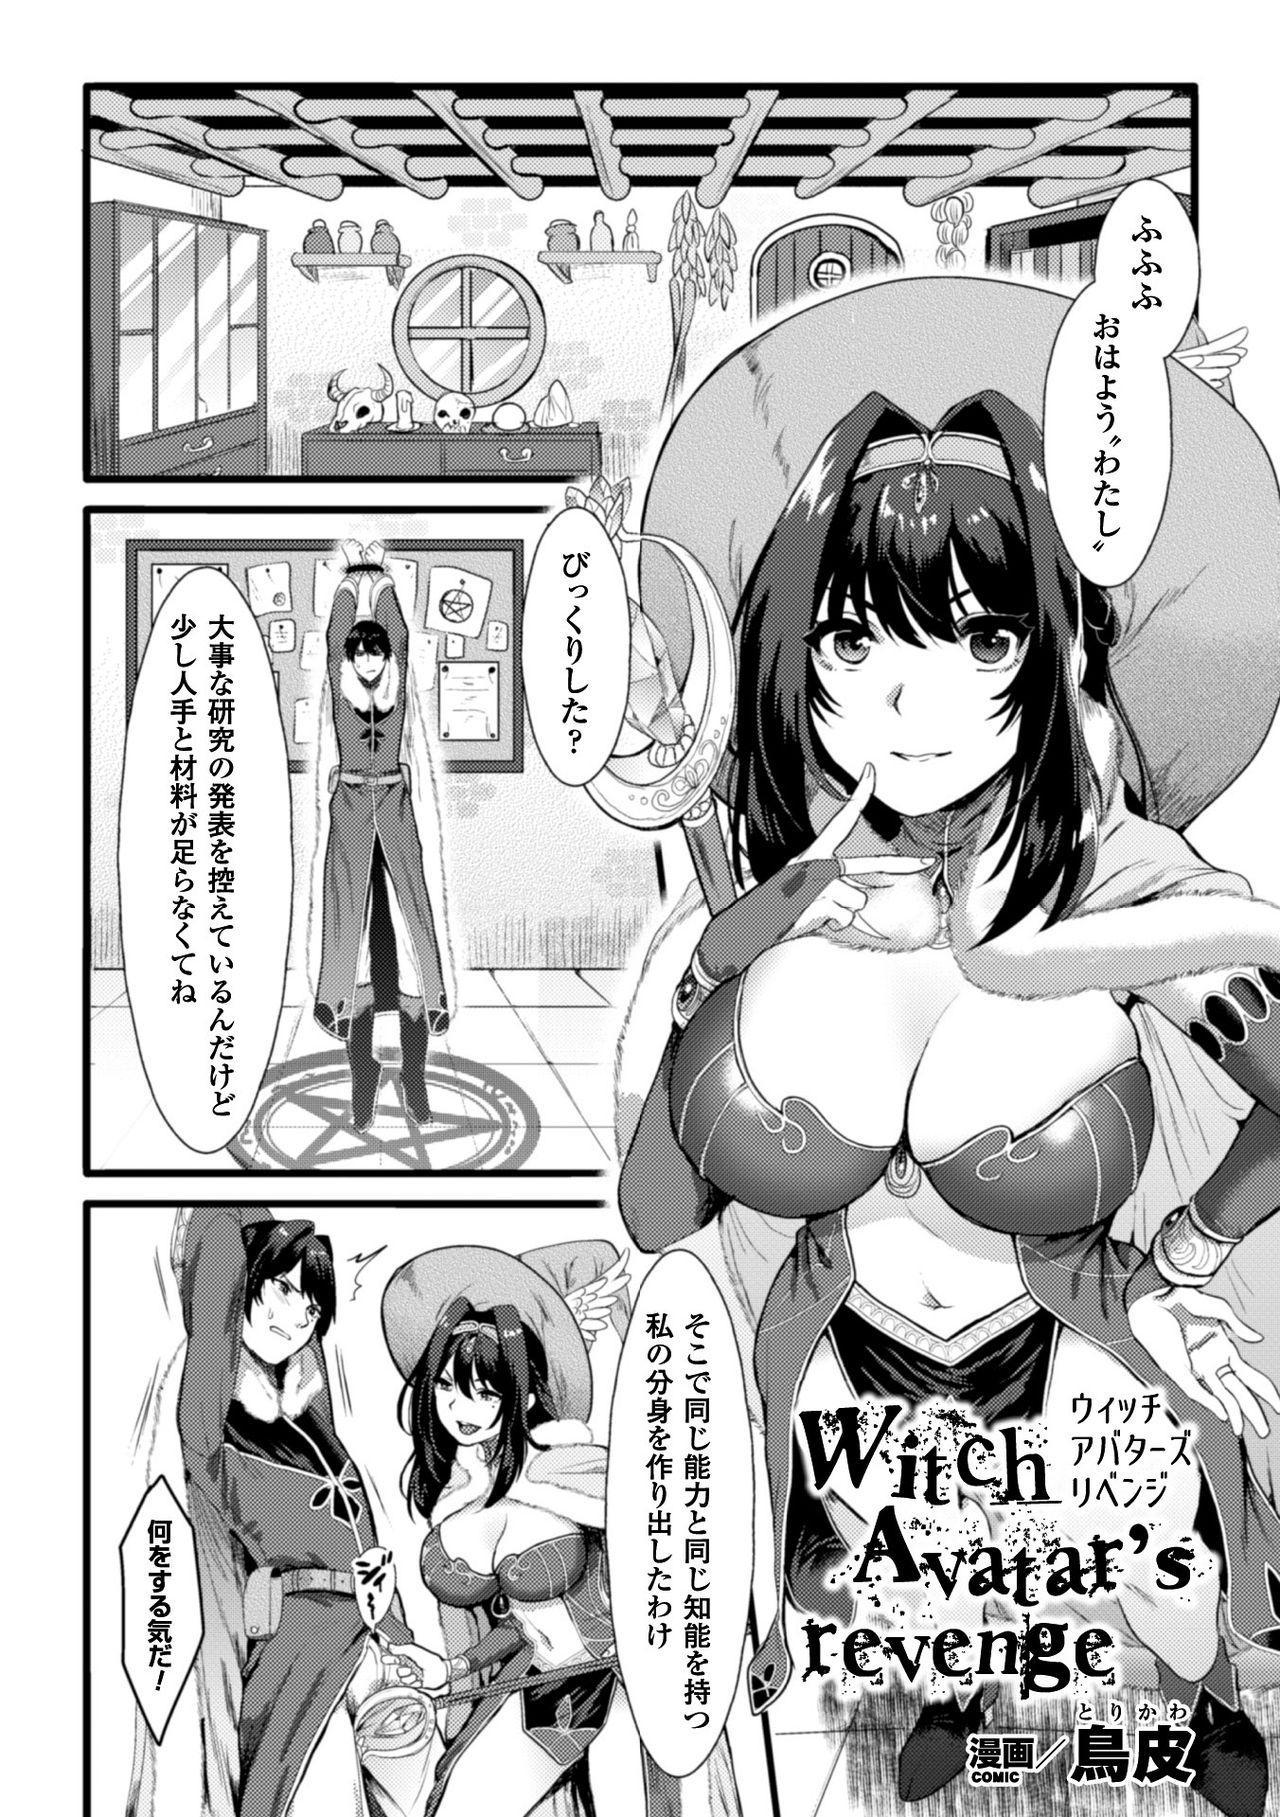 2D Comic Magazine TS Jibun Heroine mou Hitori no Ore ga Erosugite Gaman Dekinee! Vol. 1 22